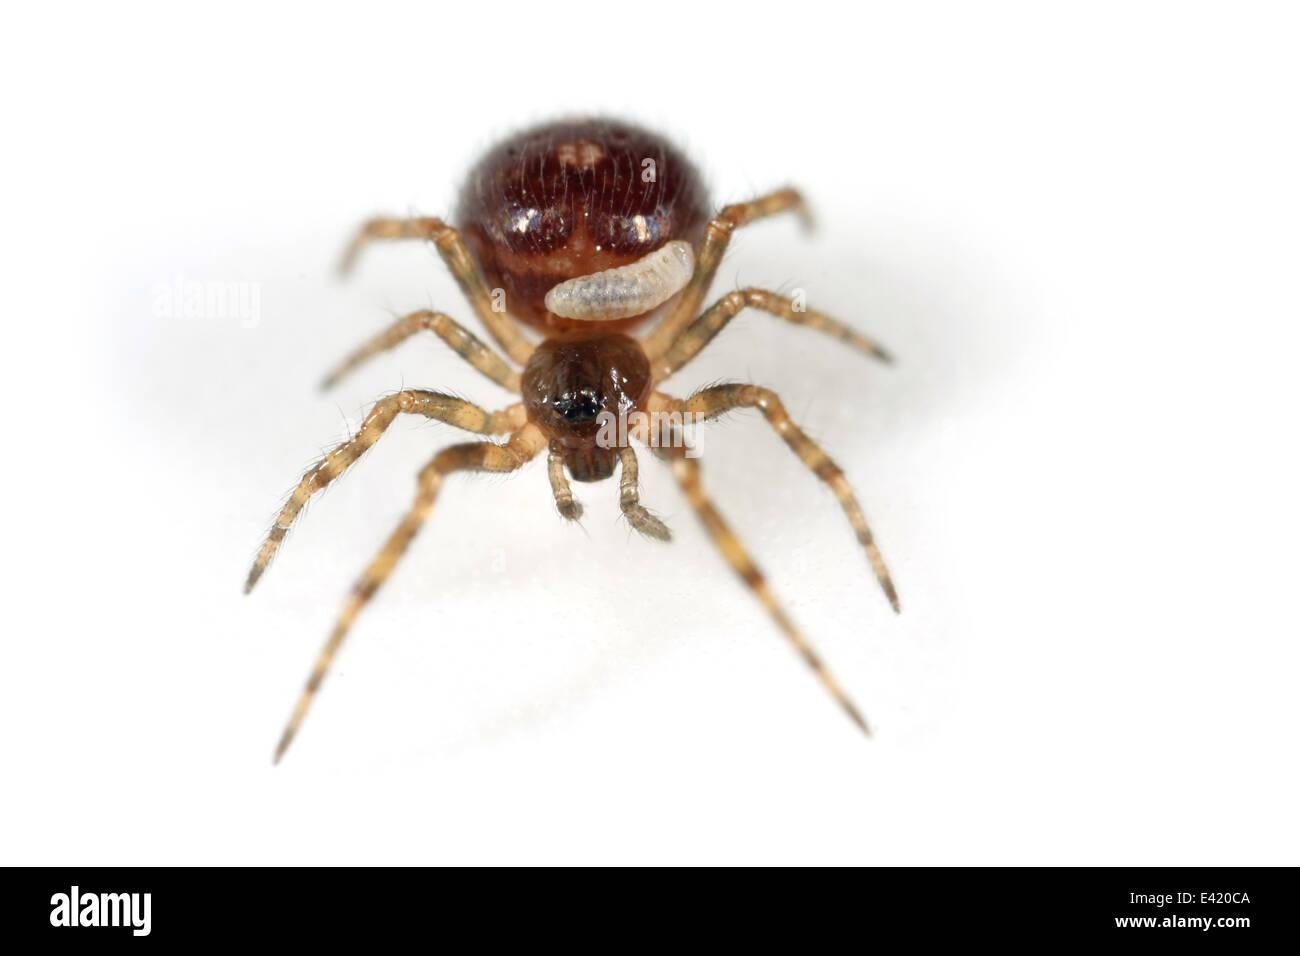 Steatoda bipunctata (Common false-widow) spider with a parasite larva. Family Theridiidae. Isolated on white background. - Stock Image